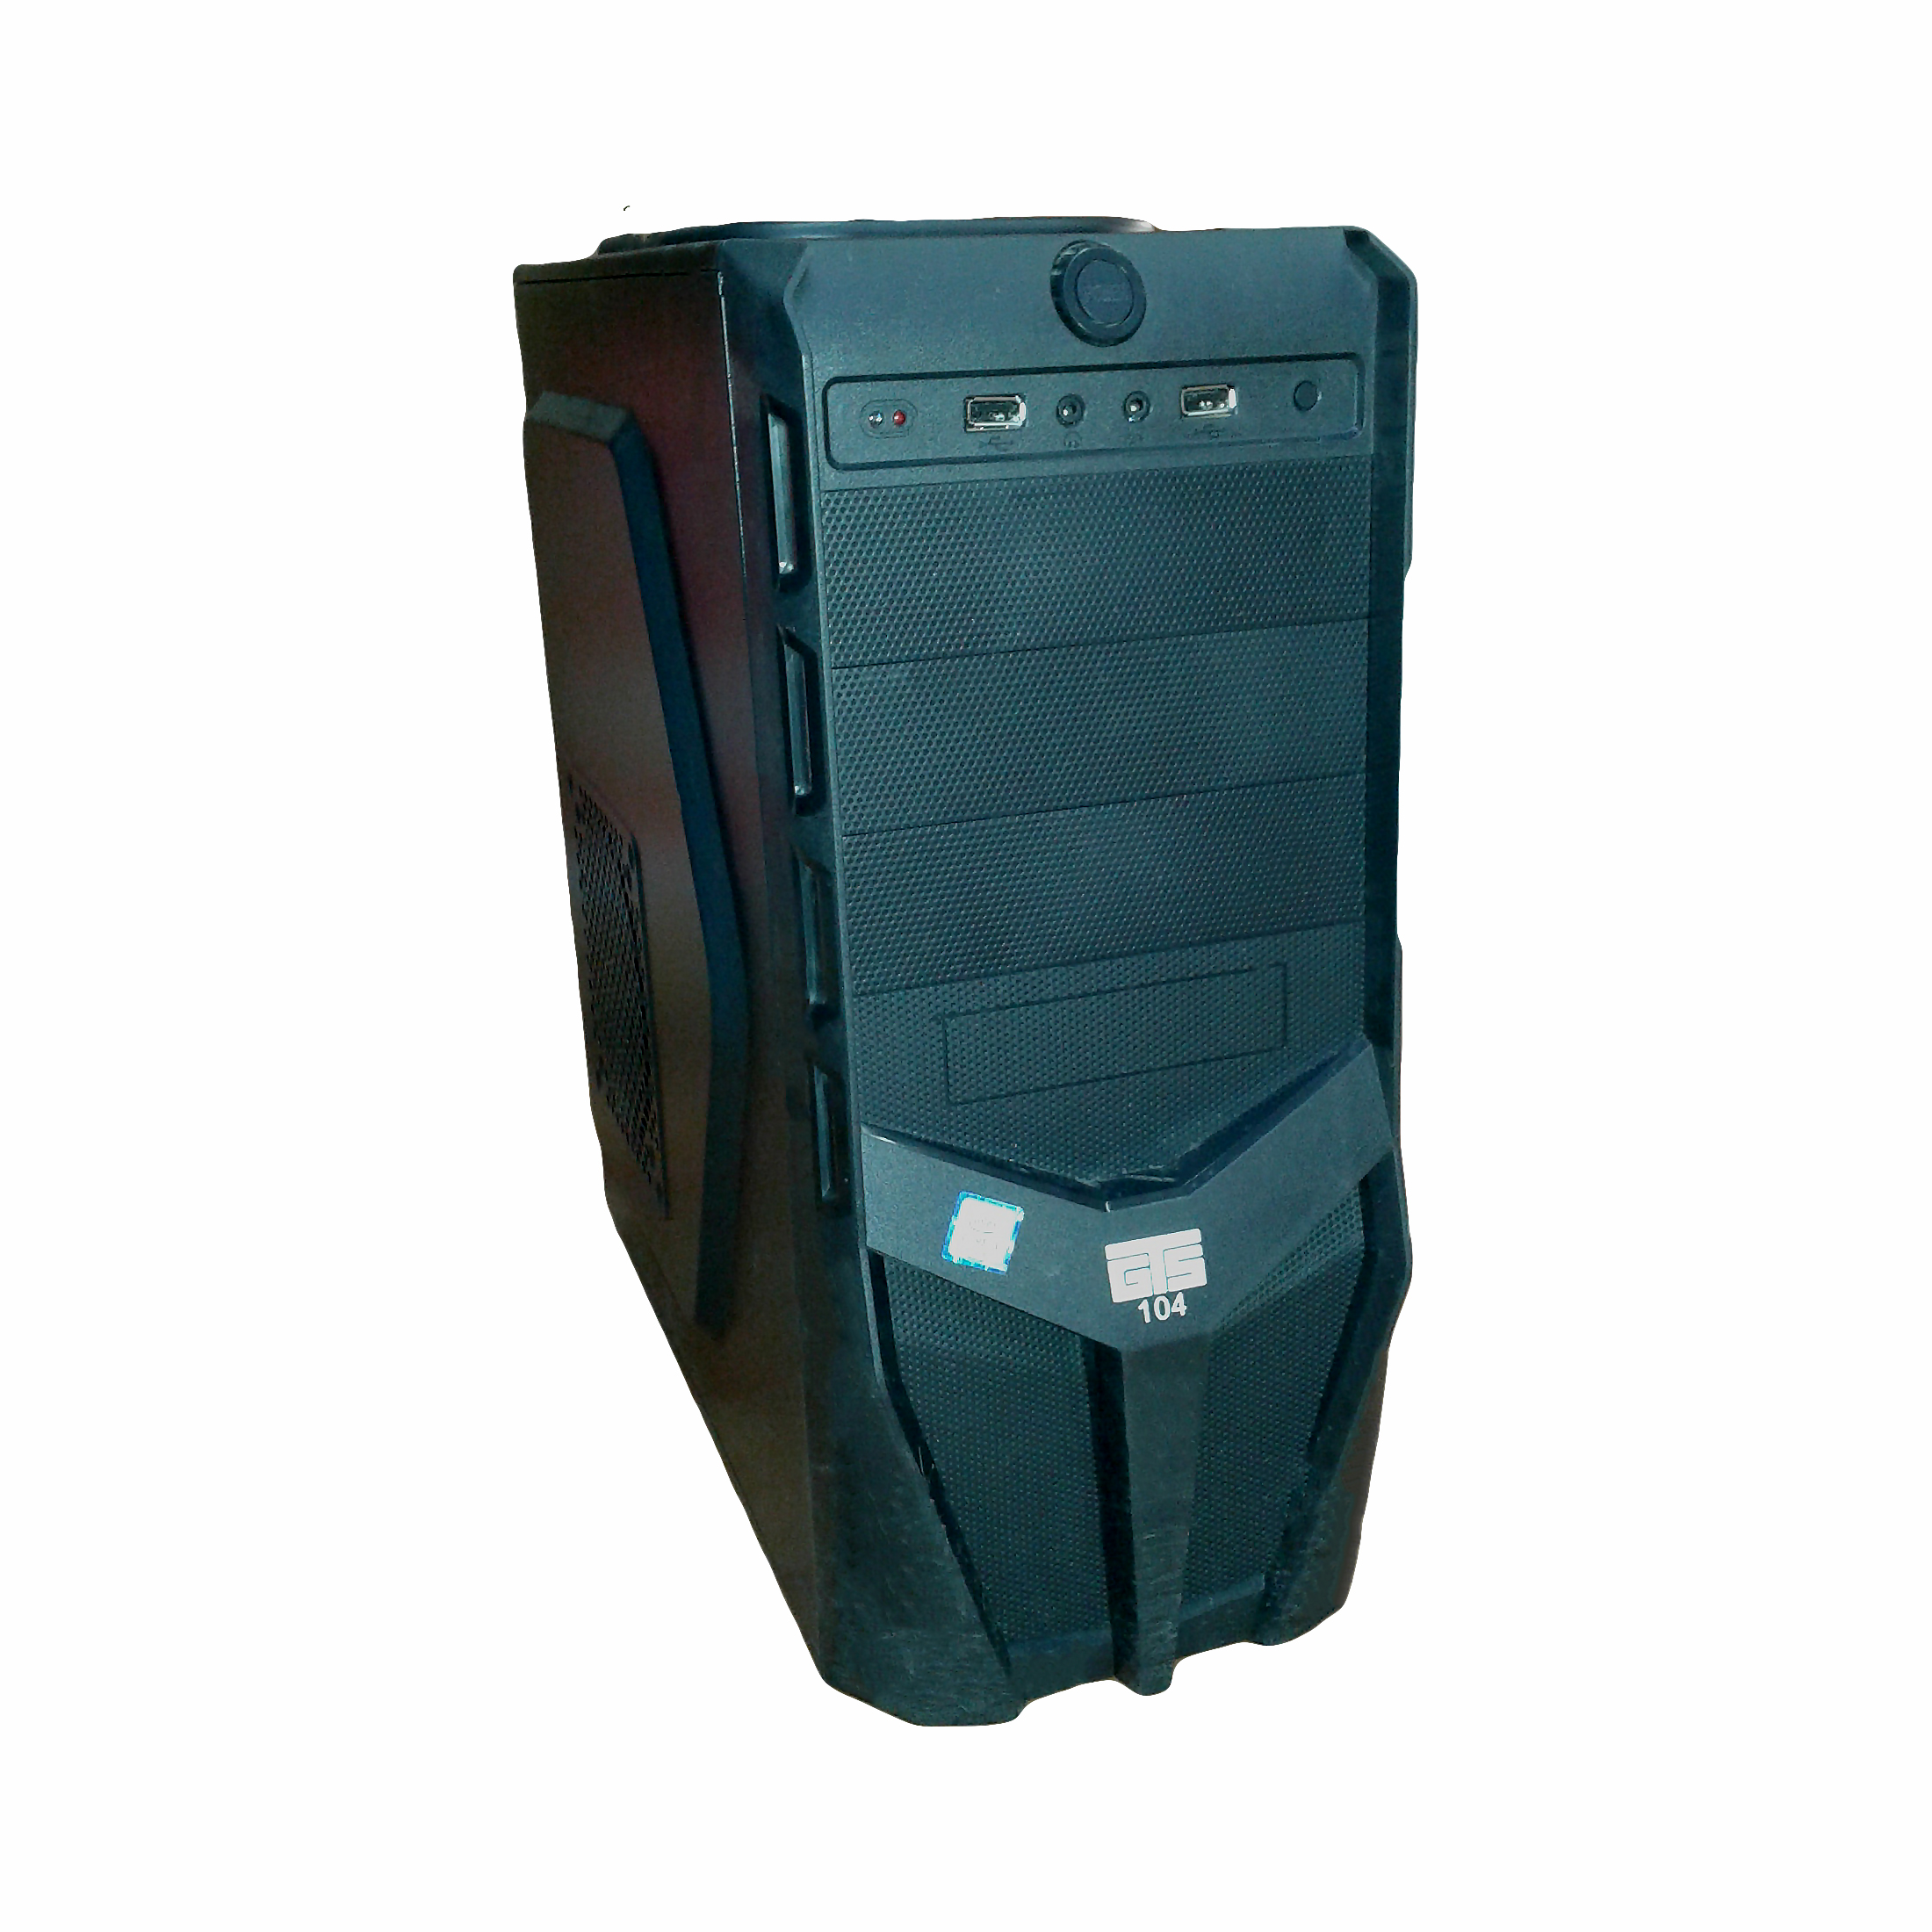 CASE I3 9100F 3.6 GHz RAM DDR4 4G 2666 MB GIGABYTE H310M-S2H HDD 1 TERRA POWER MERCURY 250W VGA AFOX GT210 1G  حاسب مكتبي تجميع ,Desktop PC